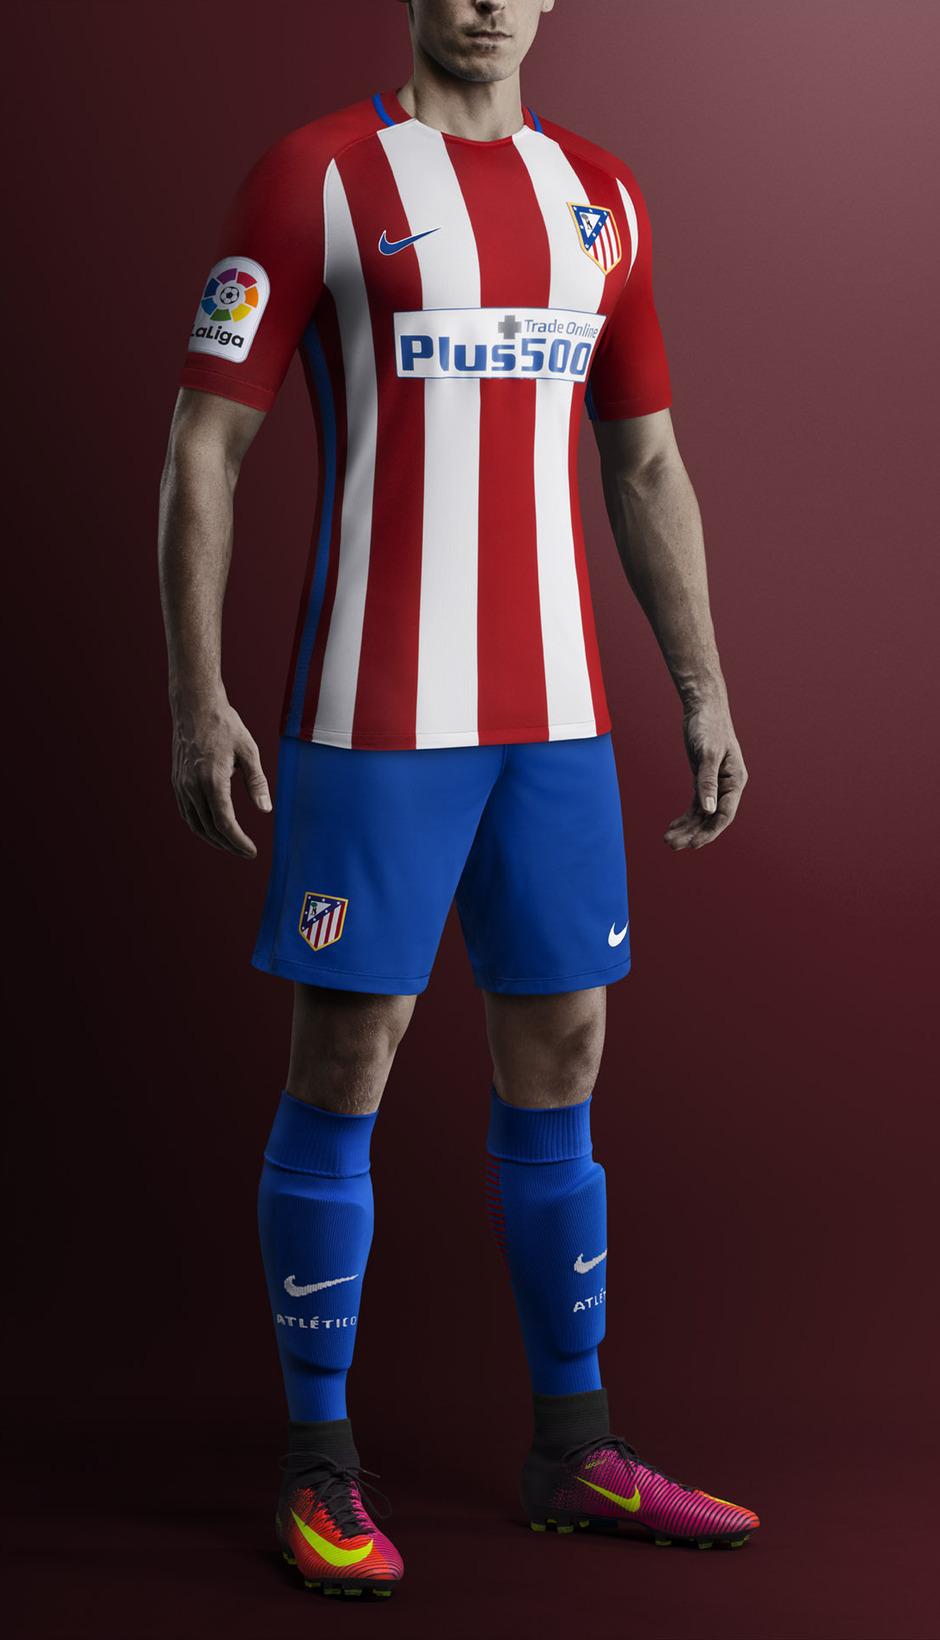 uniforme Atlético de Madrid hombre